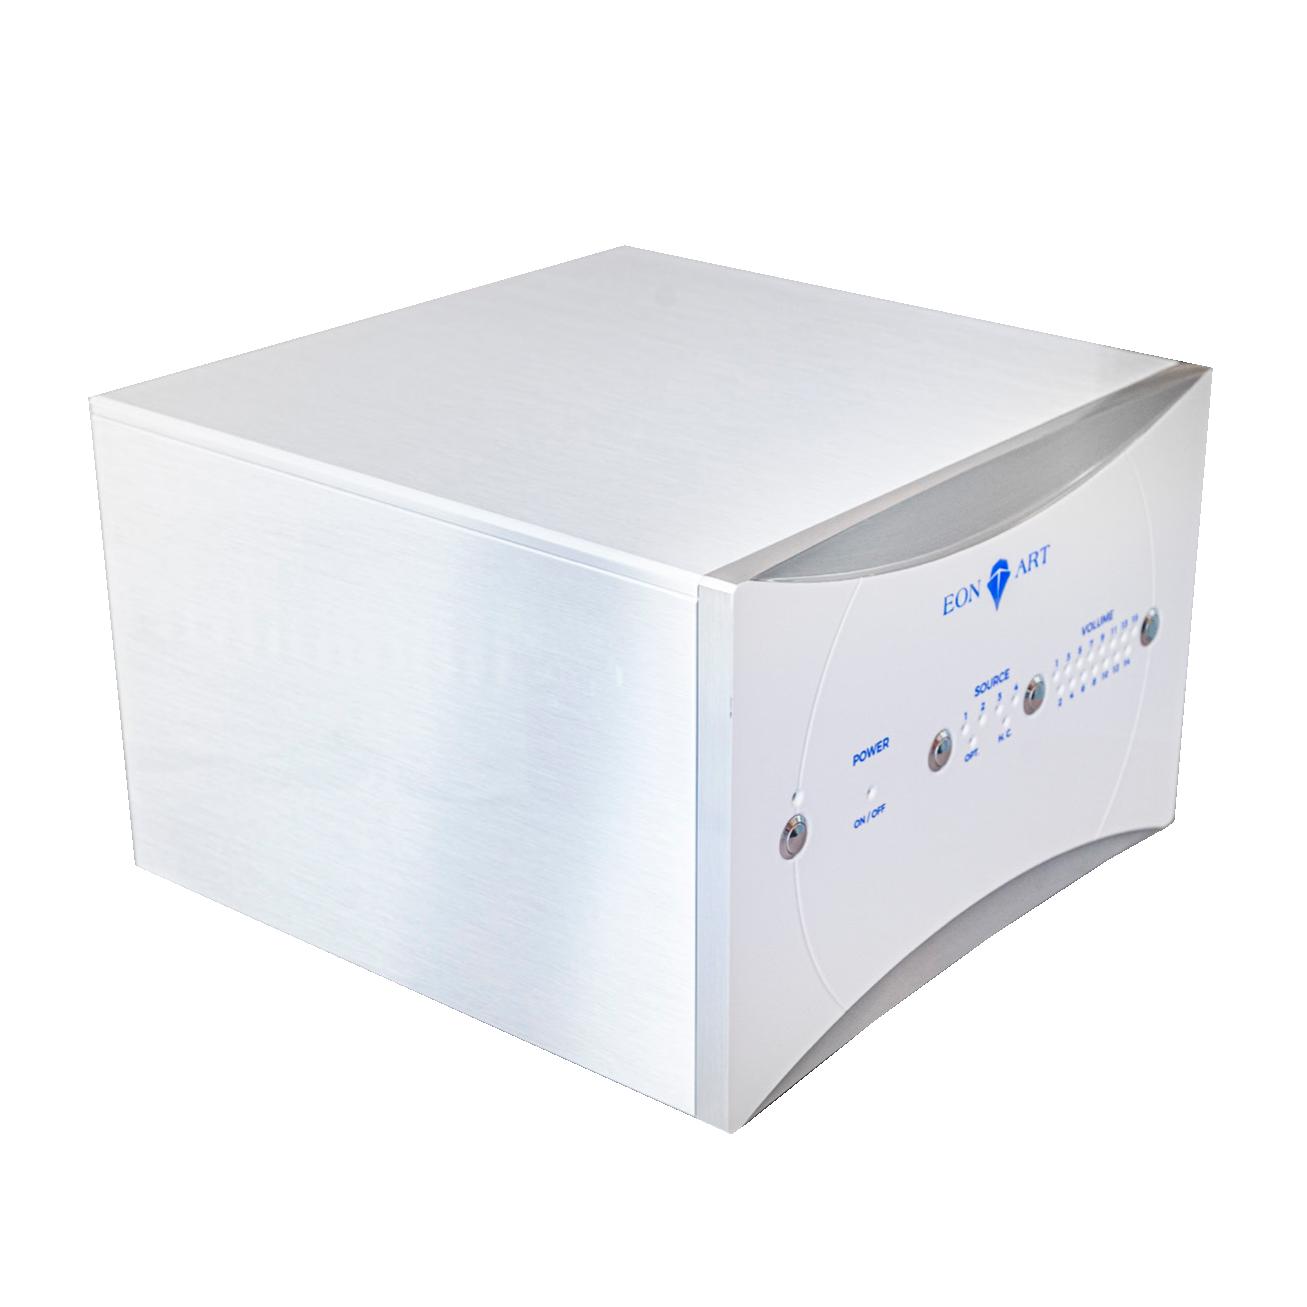 Eon Art Tachyon digital audio converter (DAC)